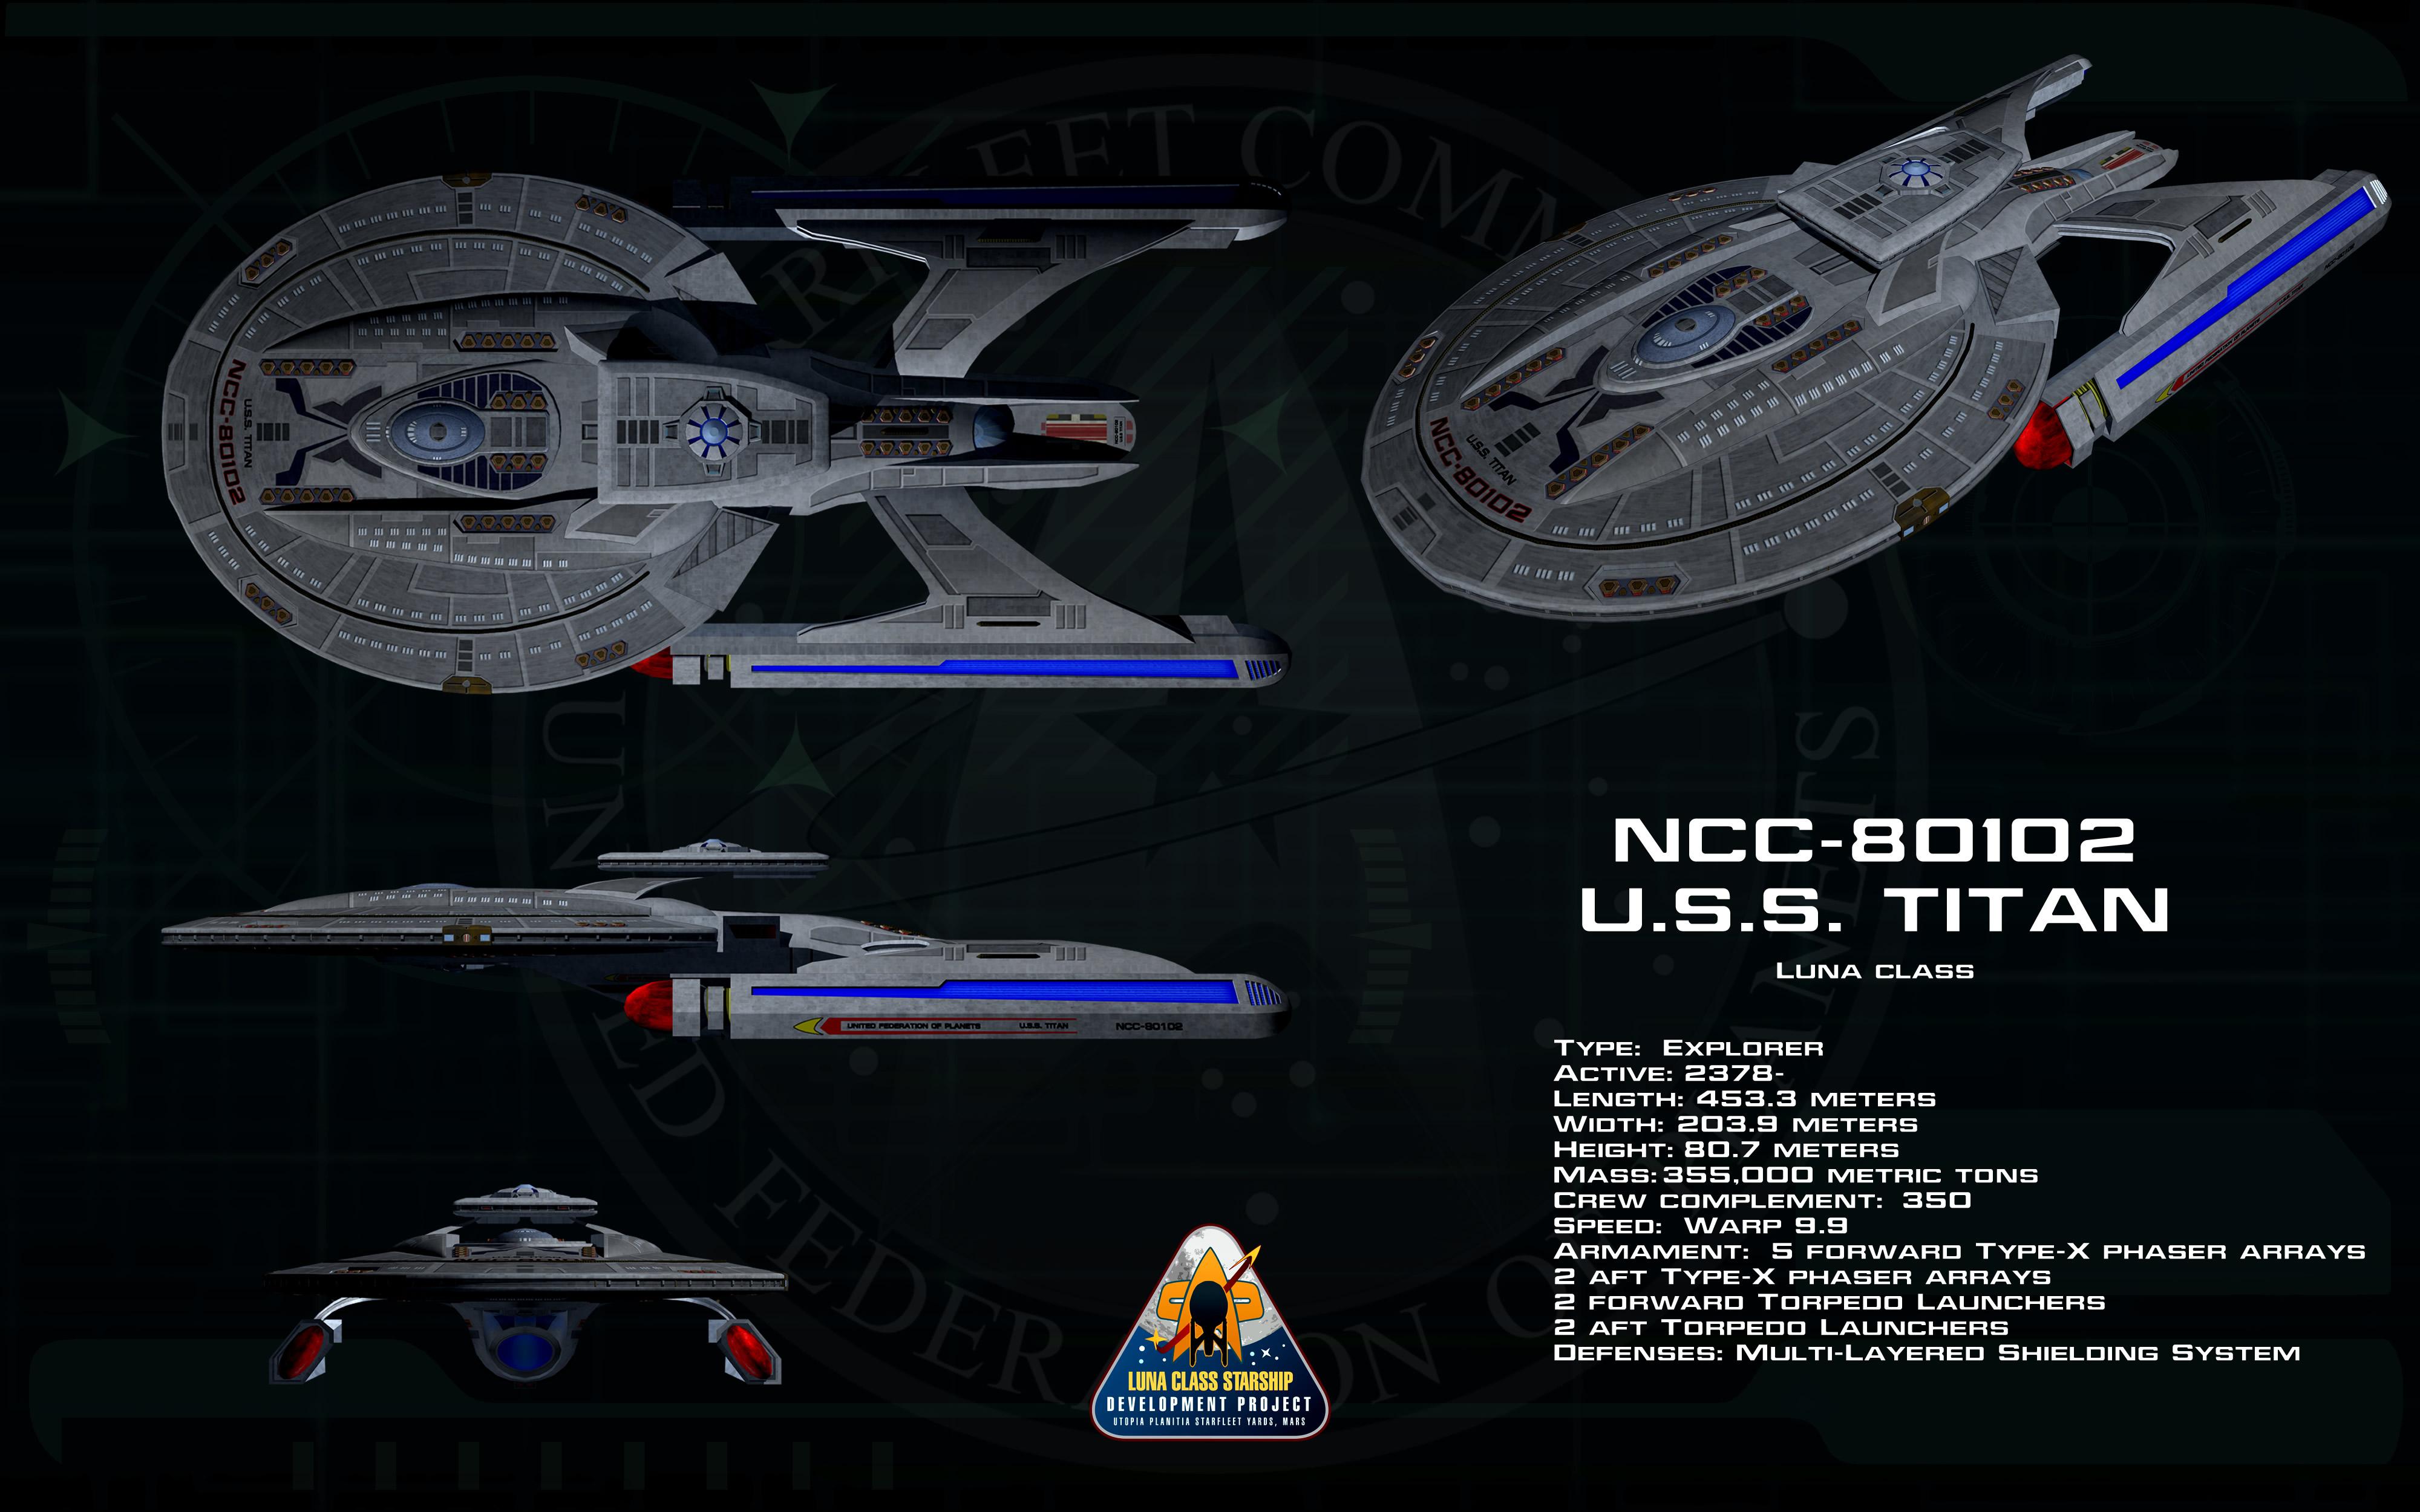 Luna class ortho - USS Titan by unusualsuspex on DeviantArt